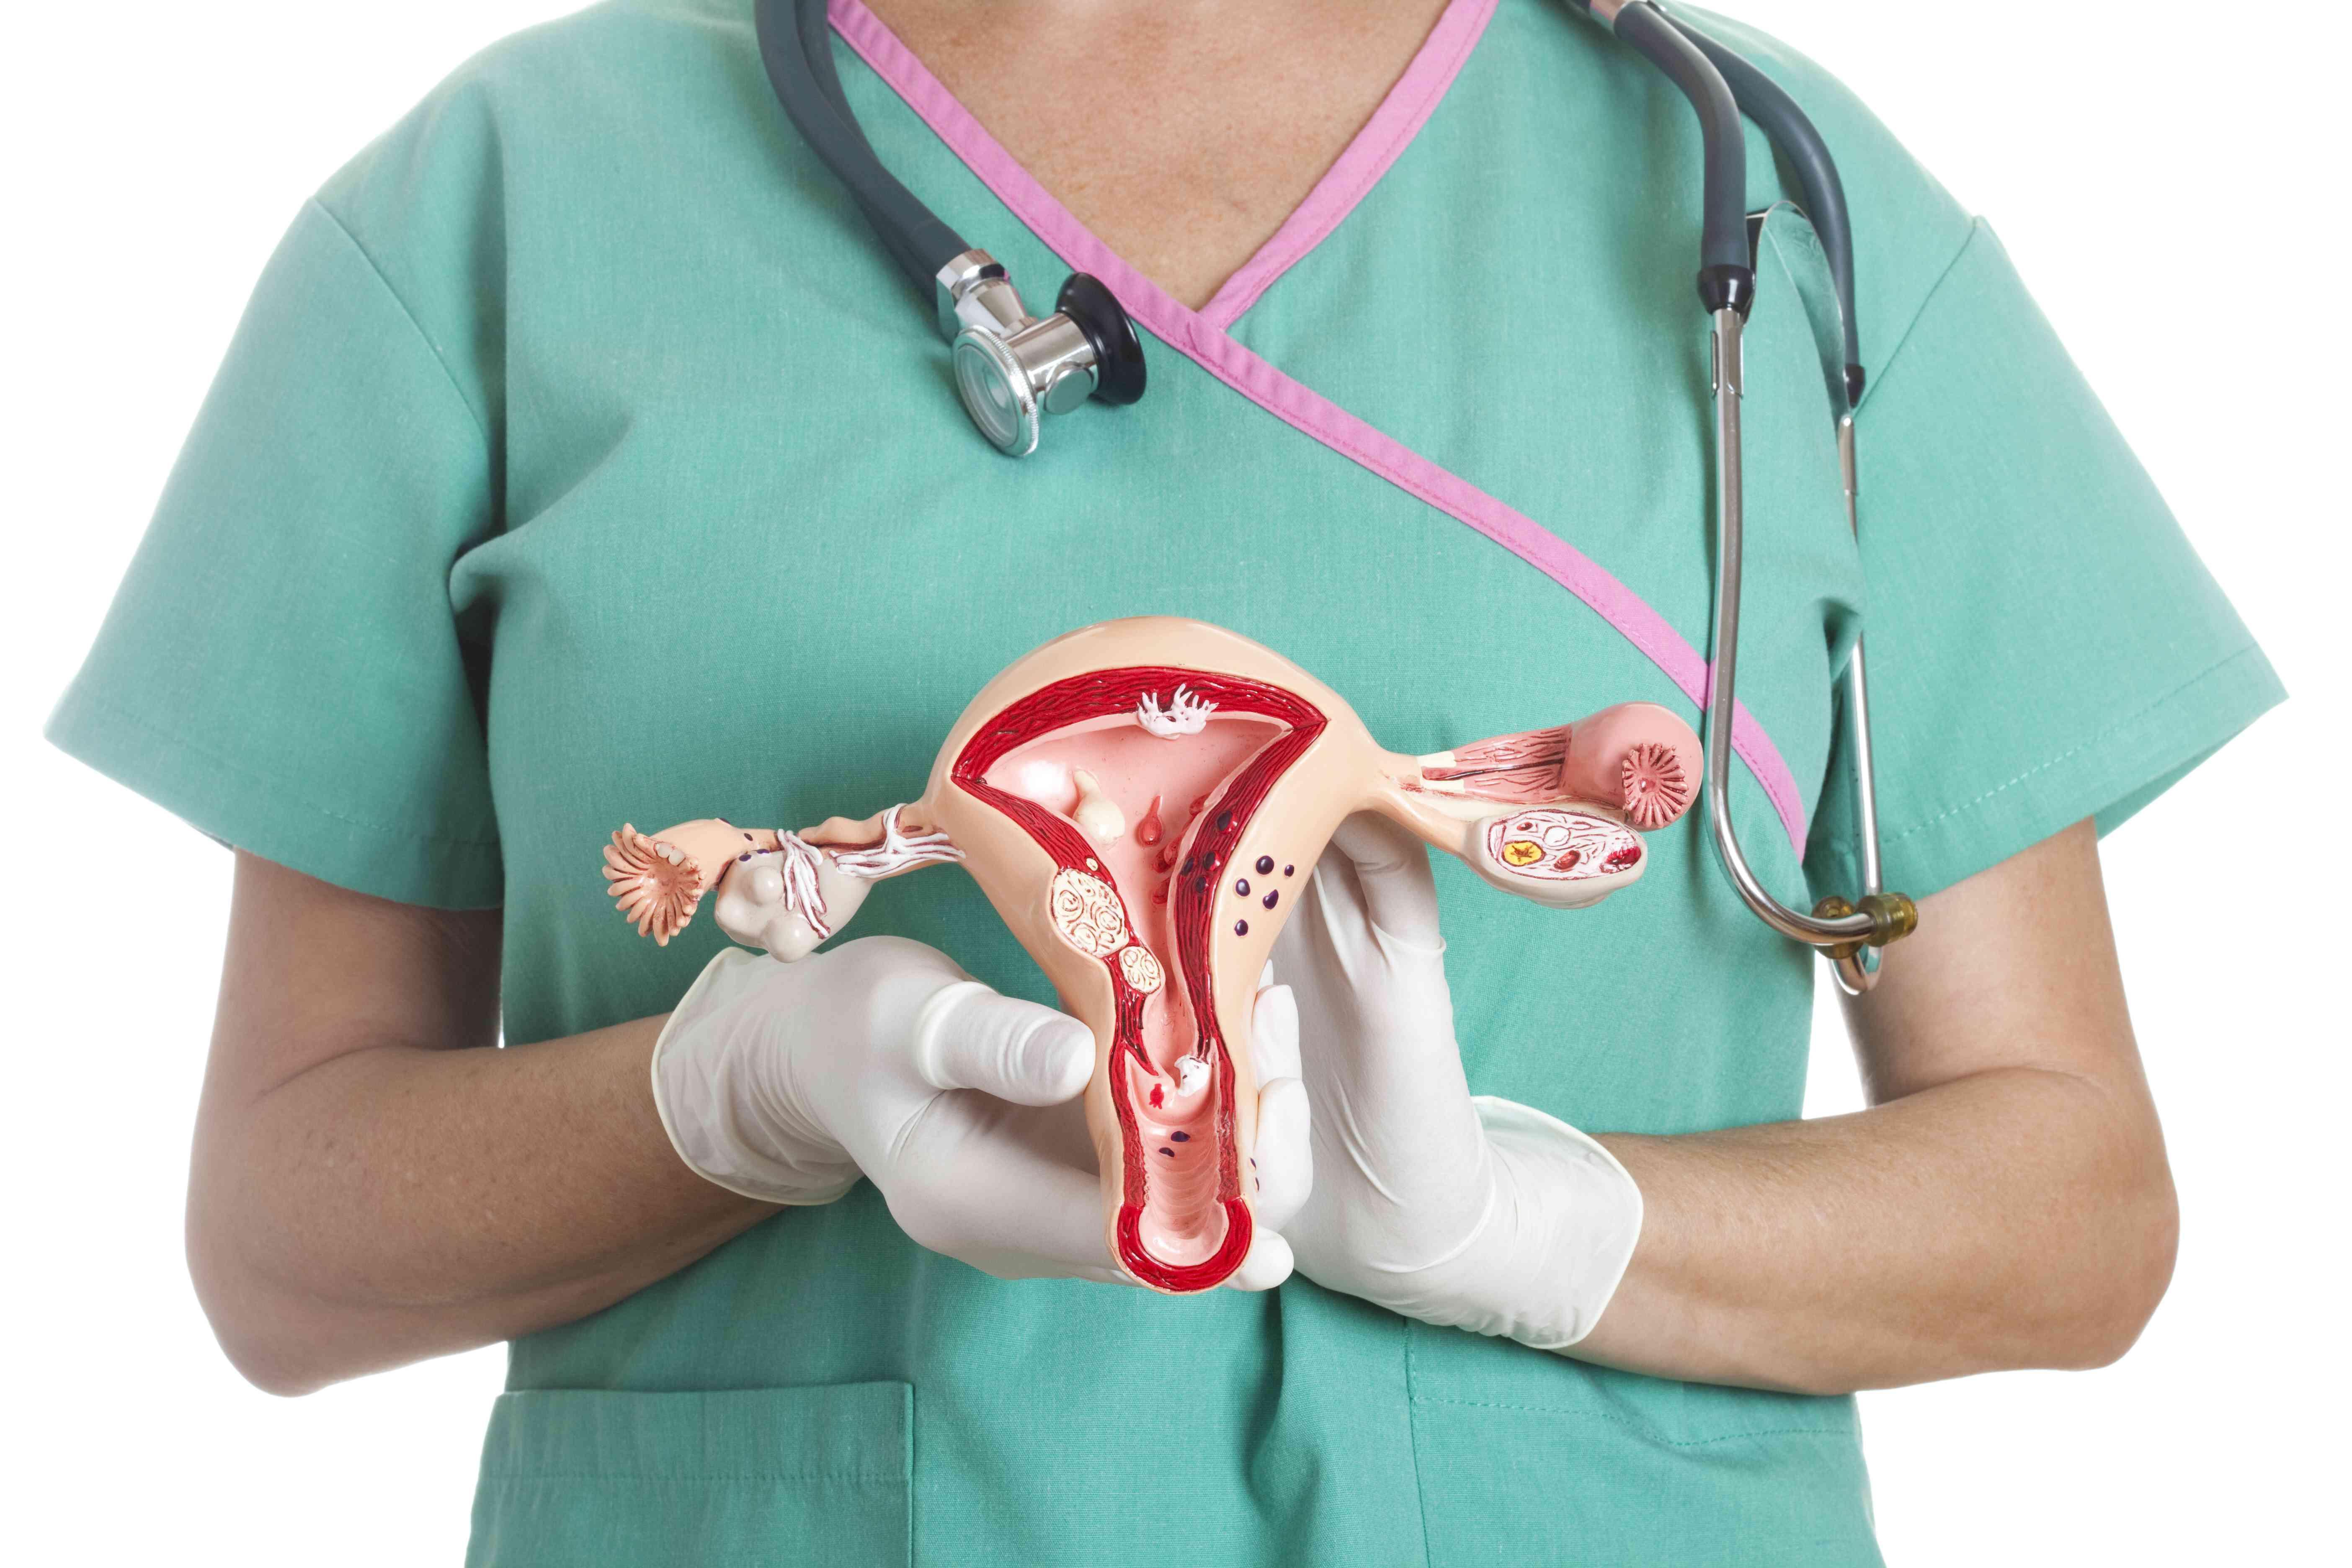 Uterus and ovaries model